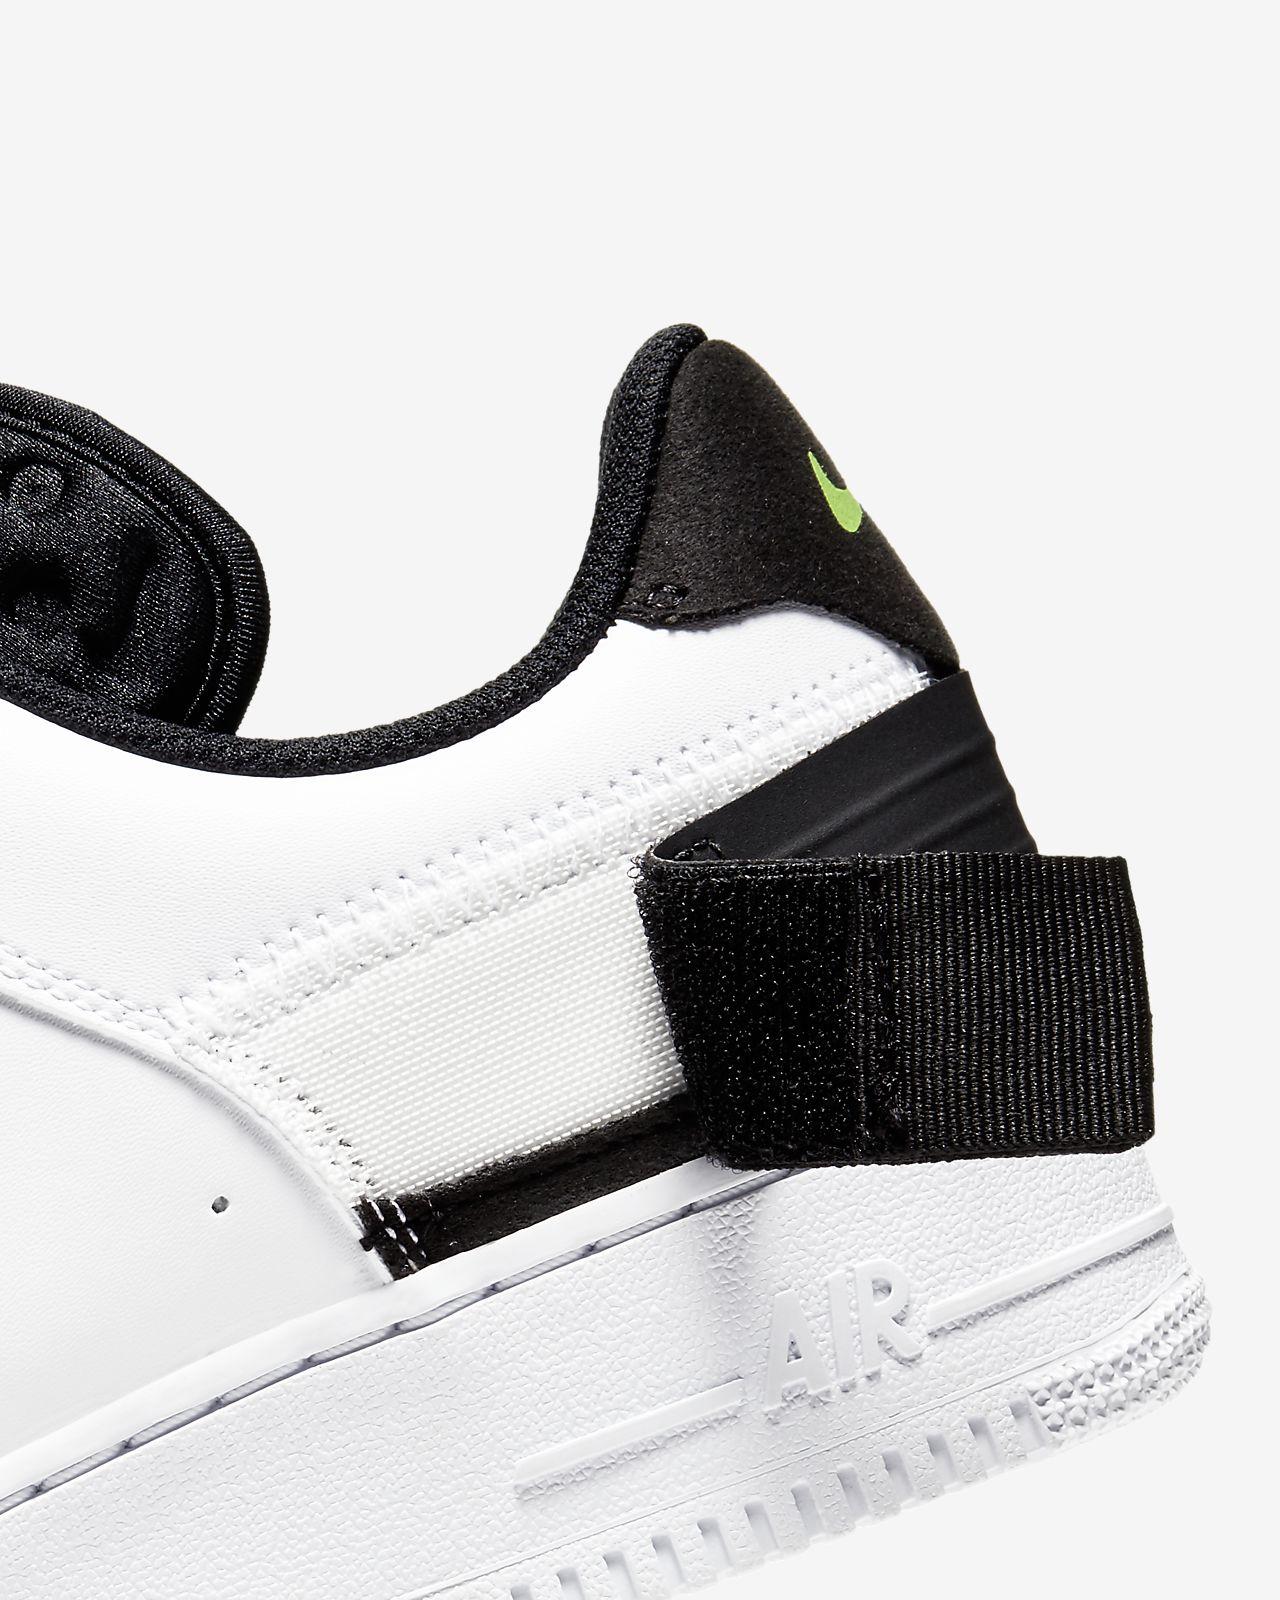 Majorwavez XVR Air Force 1 | Sneaker boots, Nike shoes